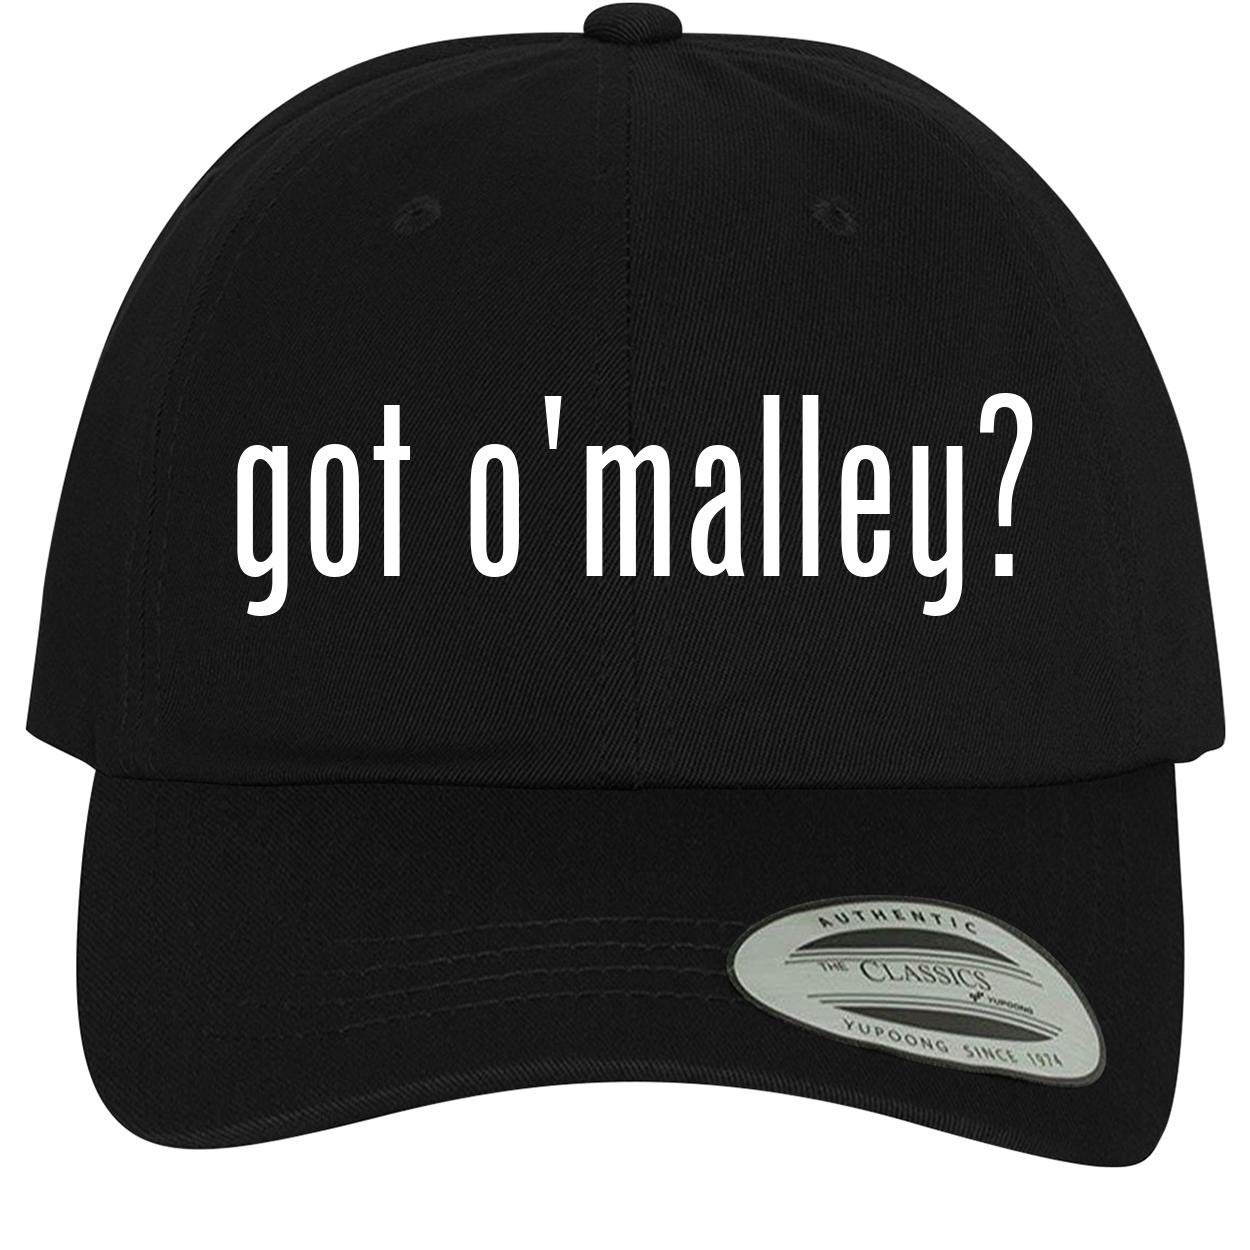 BH Cool Designs got OMalley? Comfortable Dad Hat Baseball Cap